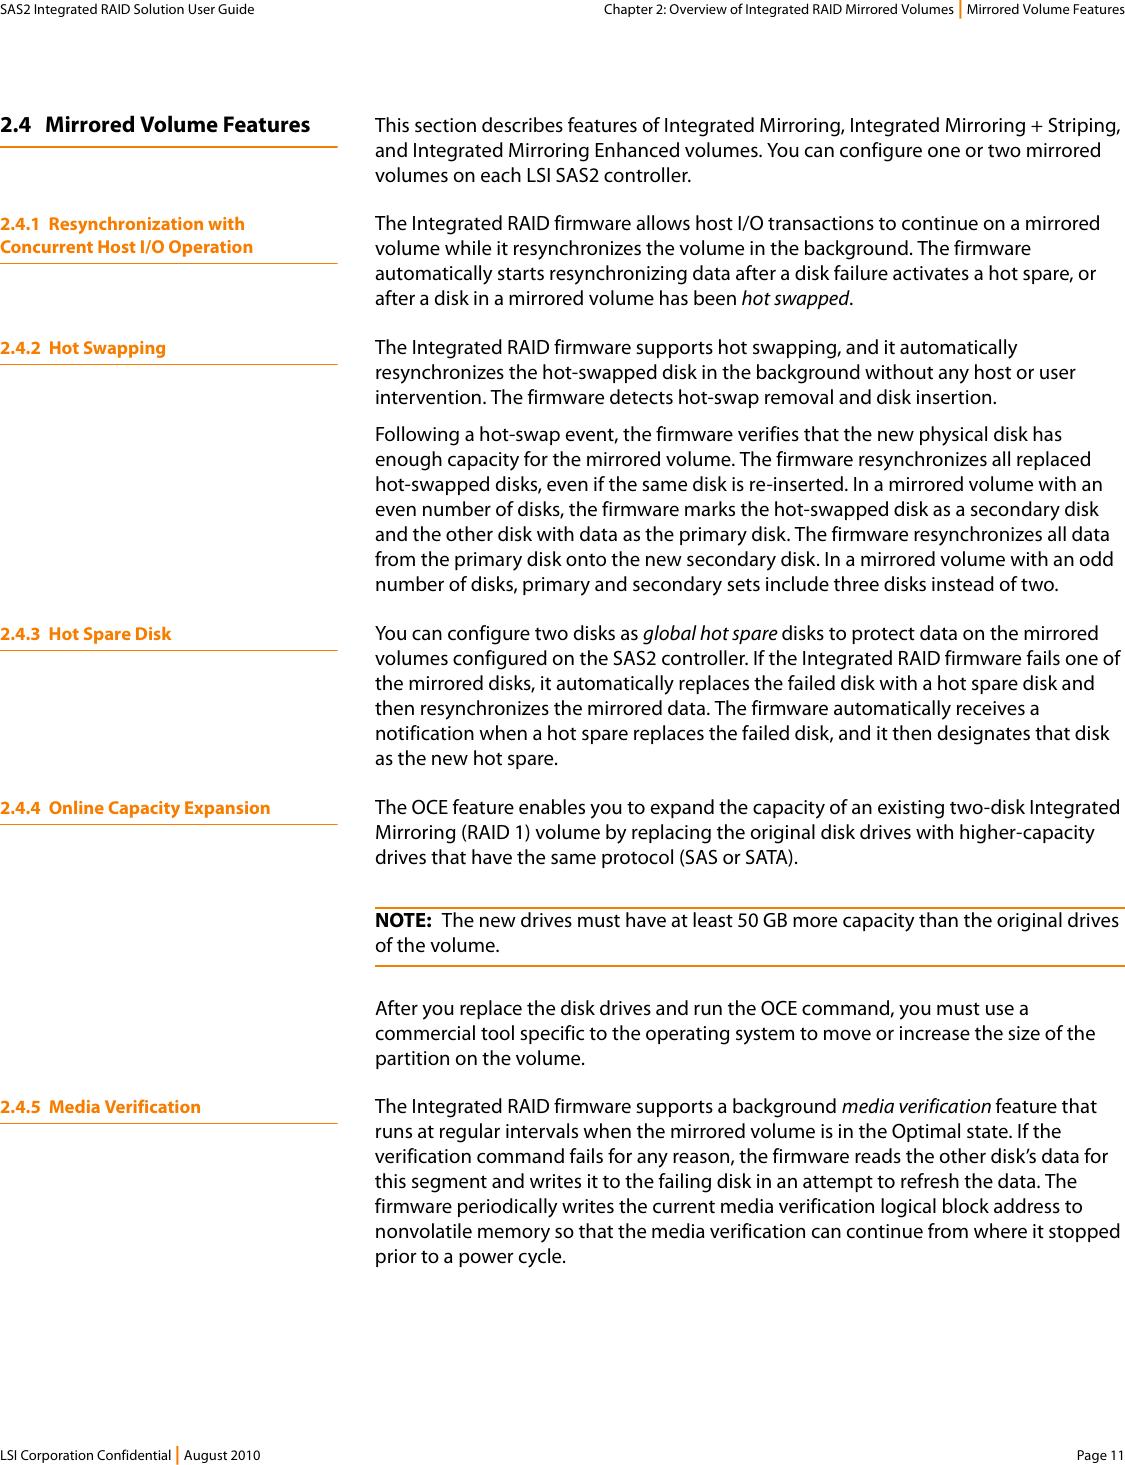 Lsi Sas2 Users Manual Integrated RAID Solution User Guide